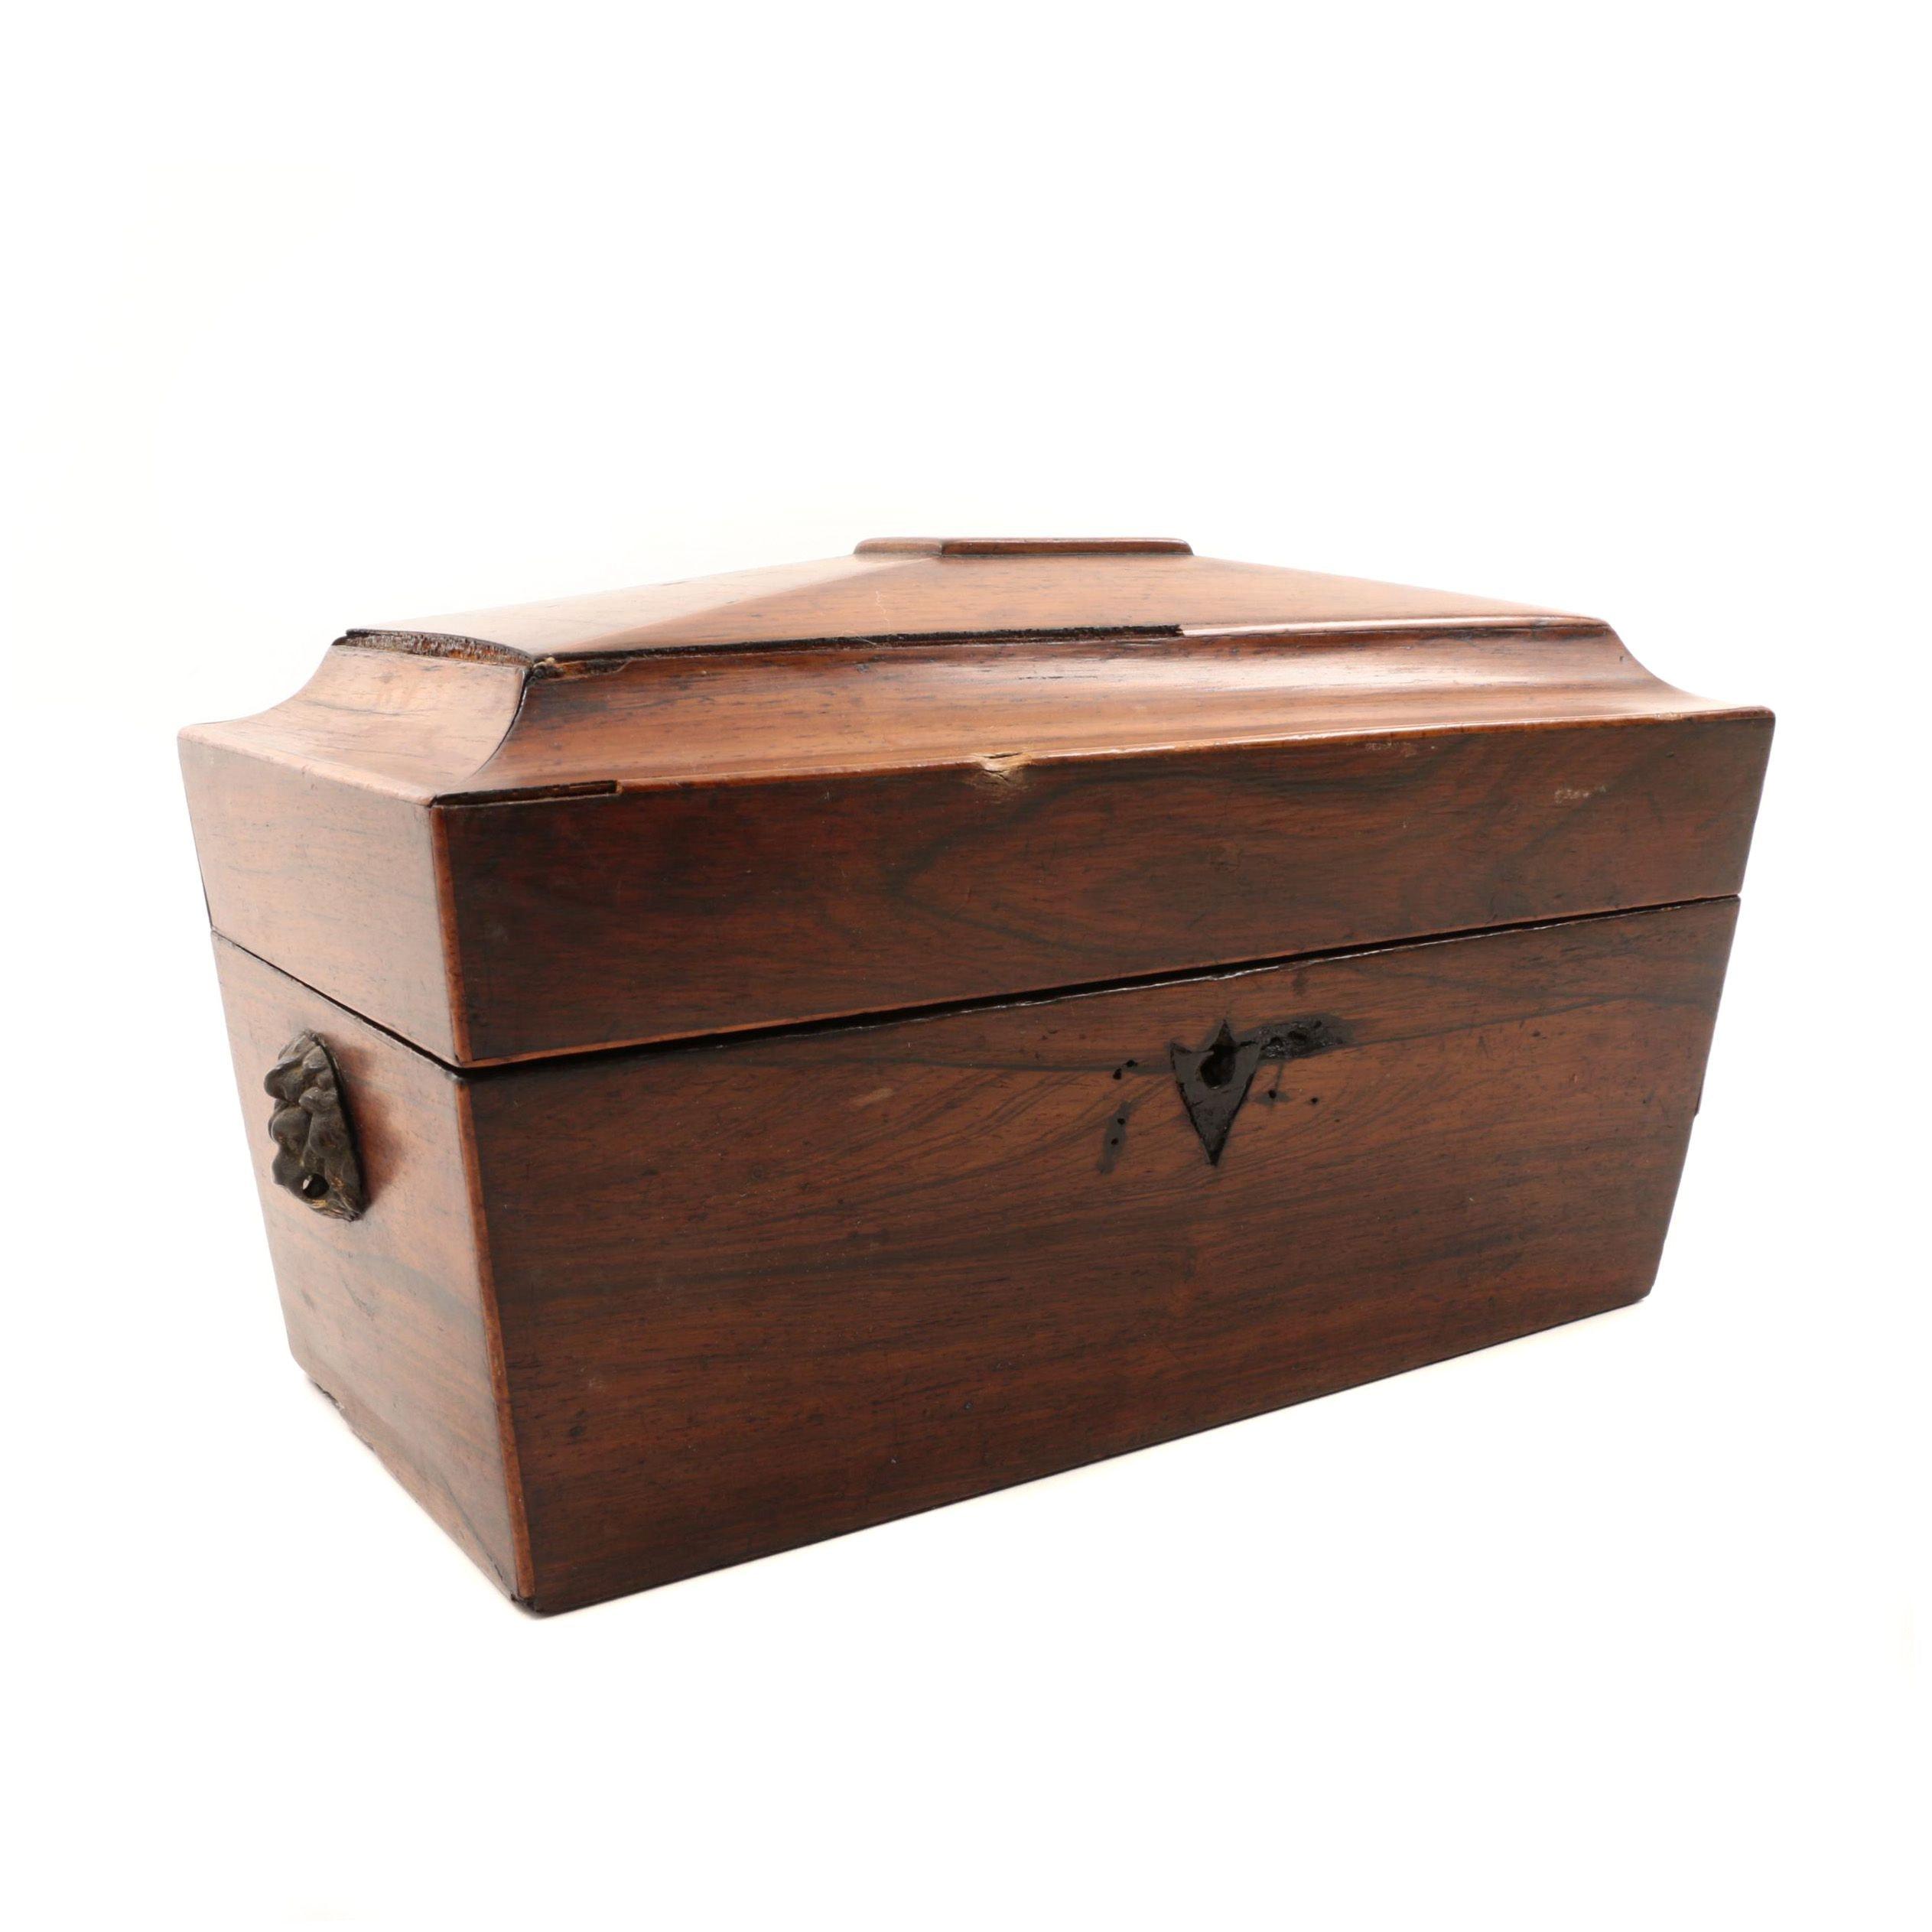 Antique English Regency Rosewood Tea Caddy